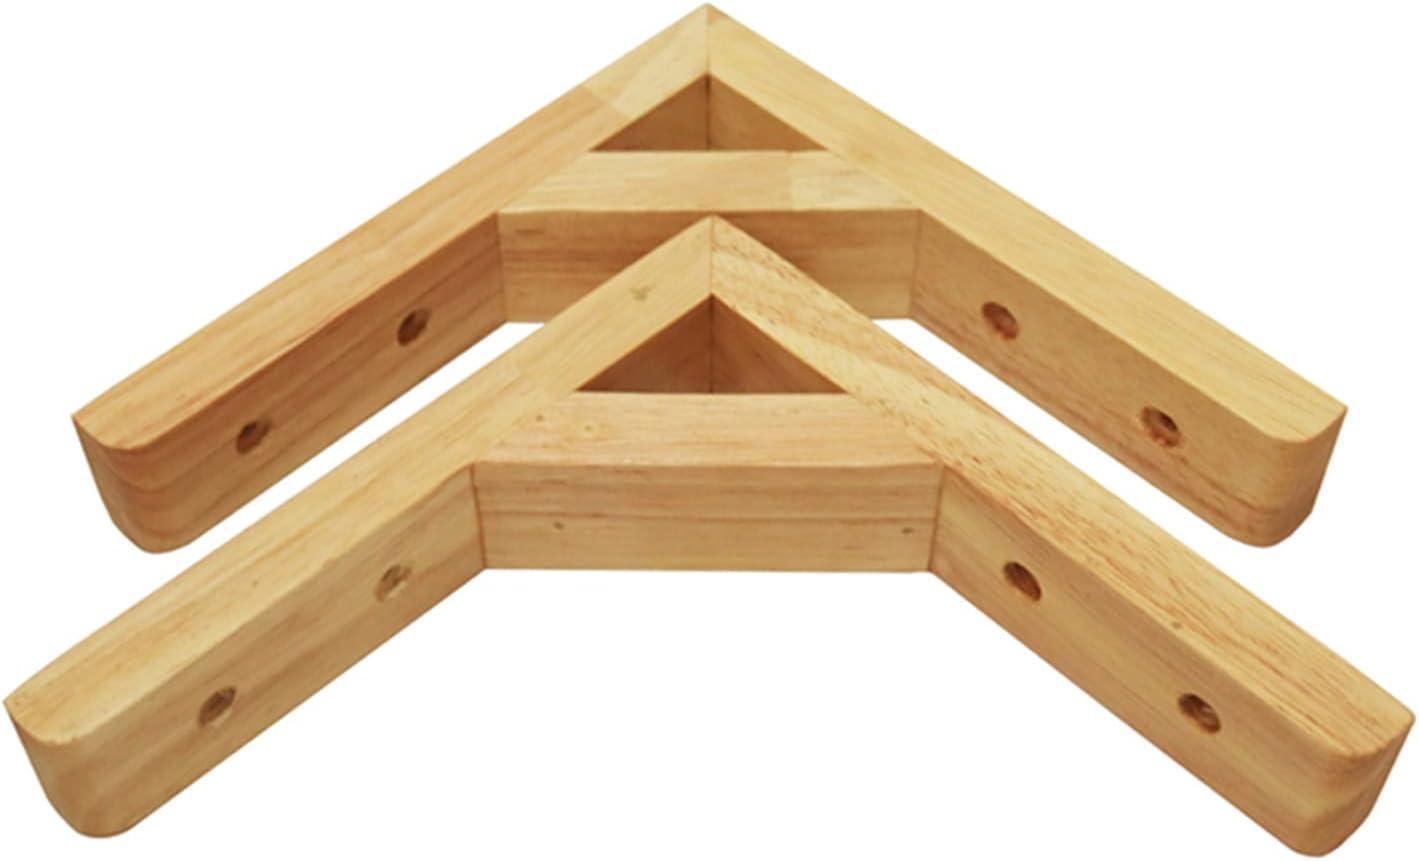 HELOU Wooden Bracket 2Pcs Bargain Wall Righ Brackets Ranking TOP10 Shelf